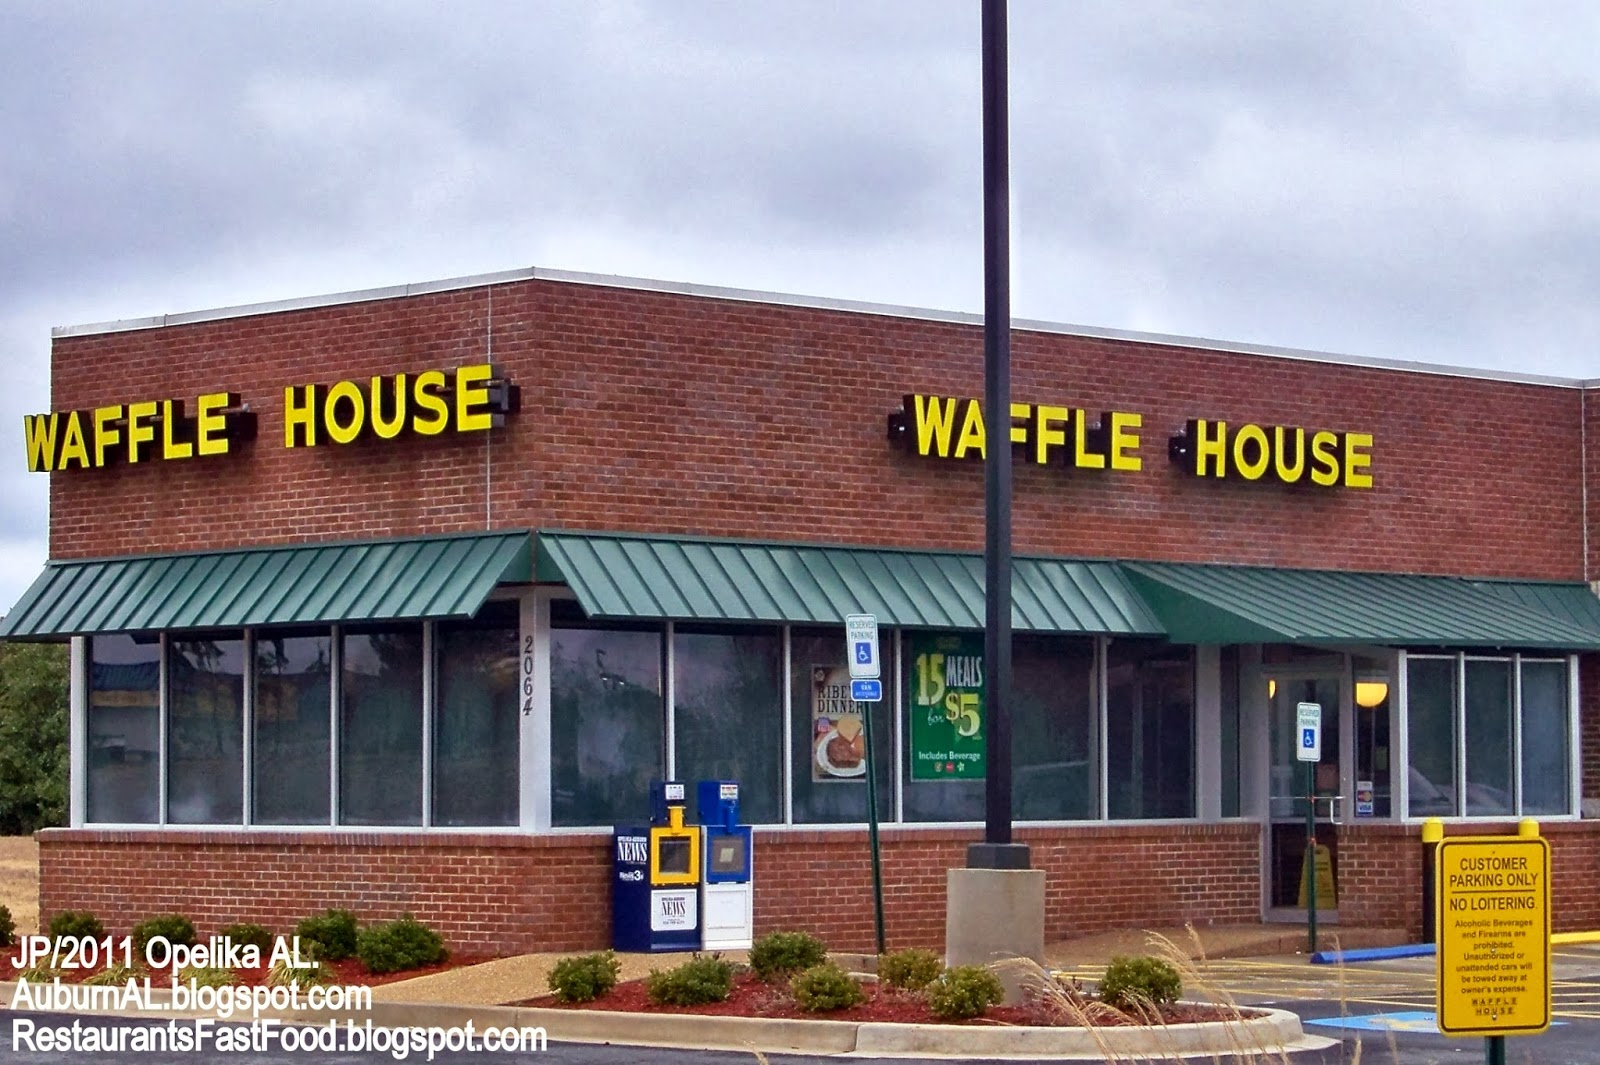 Alabama lee county salem - Waffle House Diner Opelika Alabama Interstate Dr Waffle House Diner Restaurant Opelika Alabama Lee County